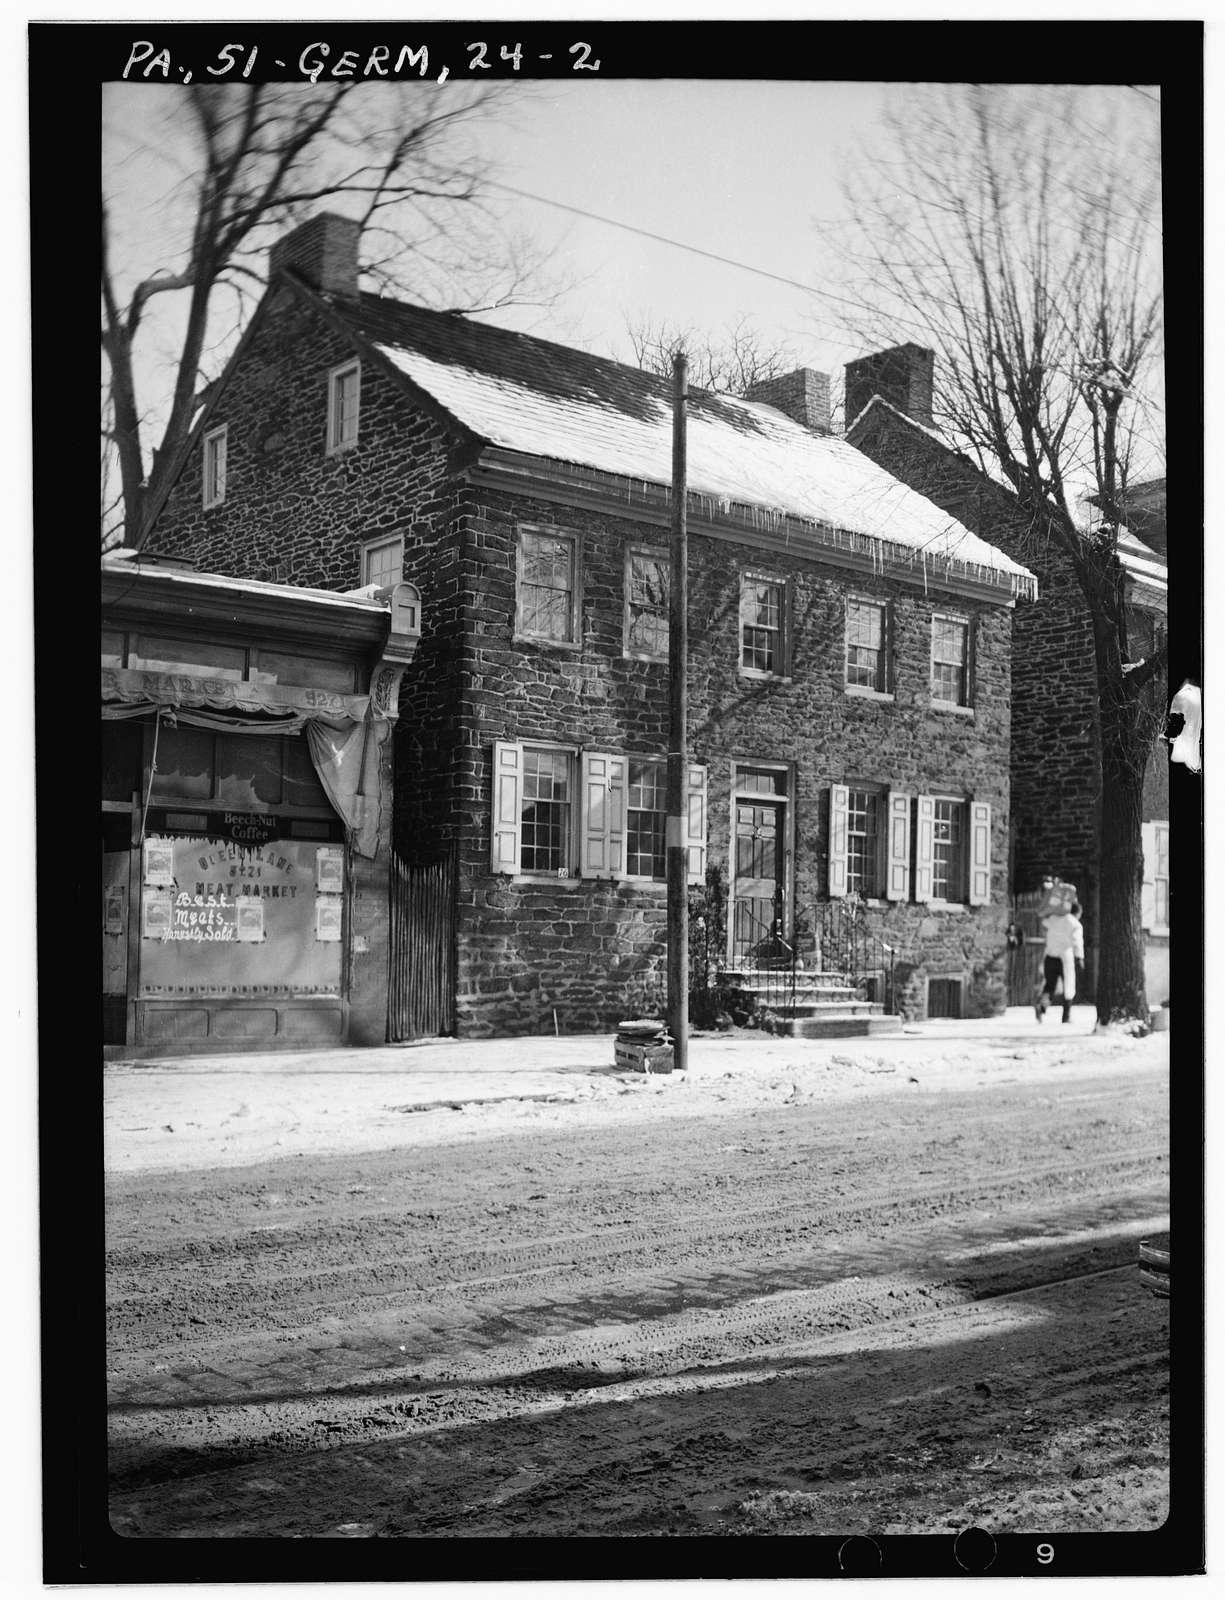 Grumblethorpe Tenant House, 5269 Germantown Avenue, Philadelphia, Philadelphia County, PA